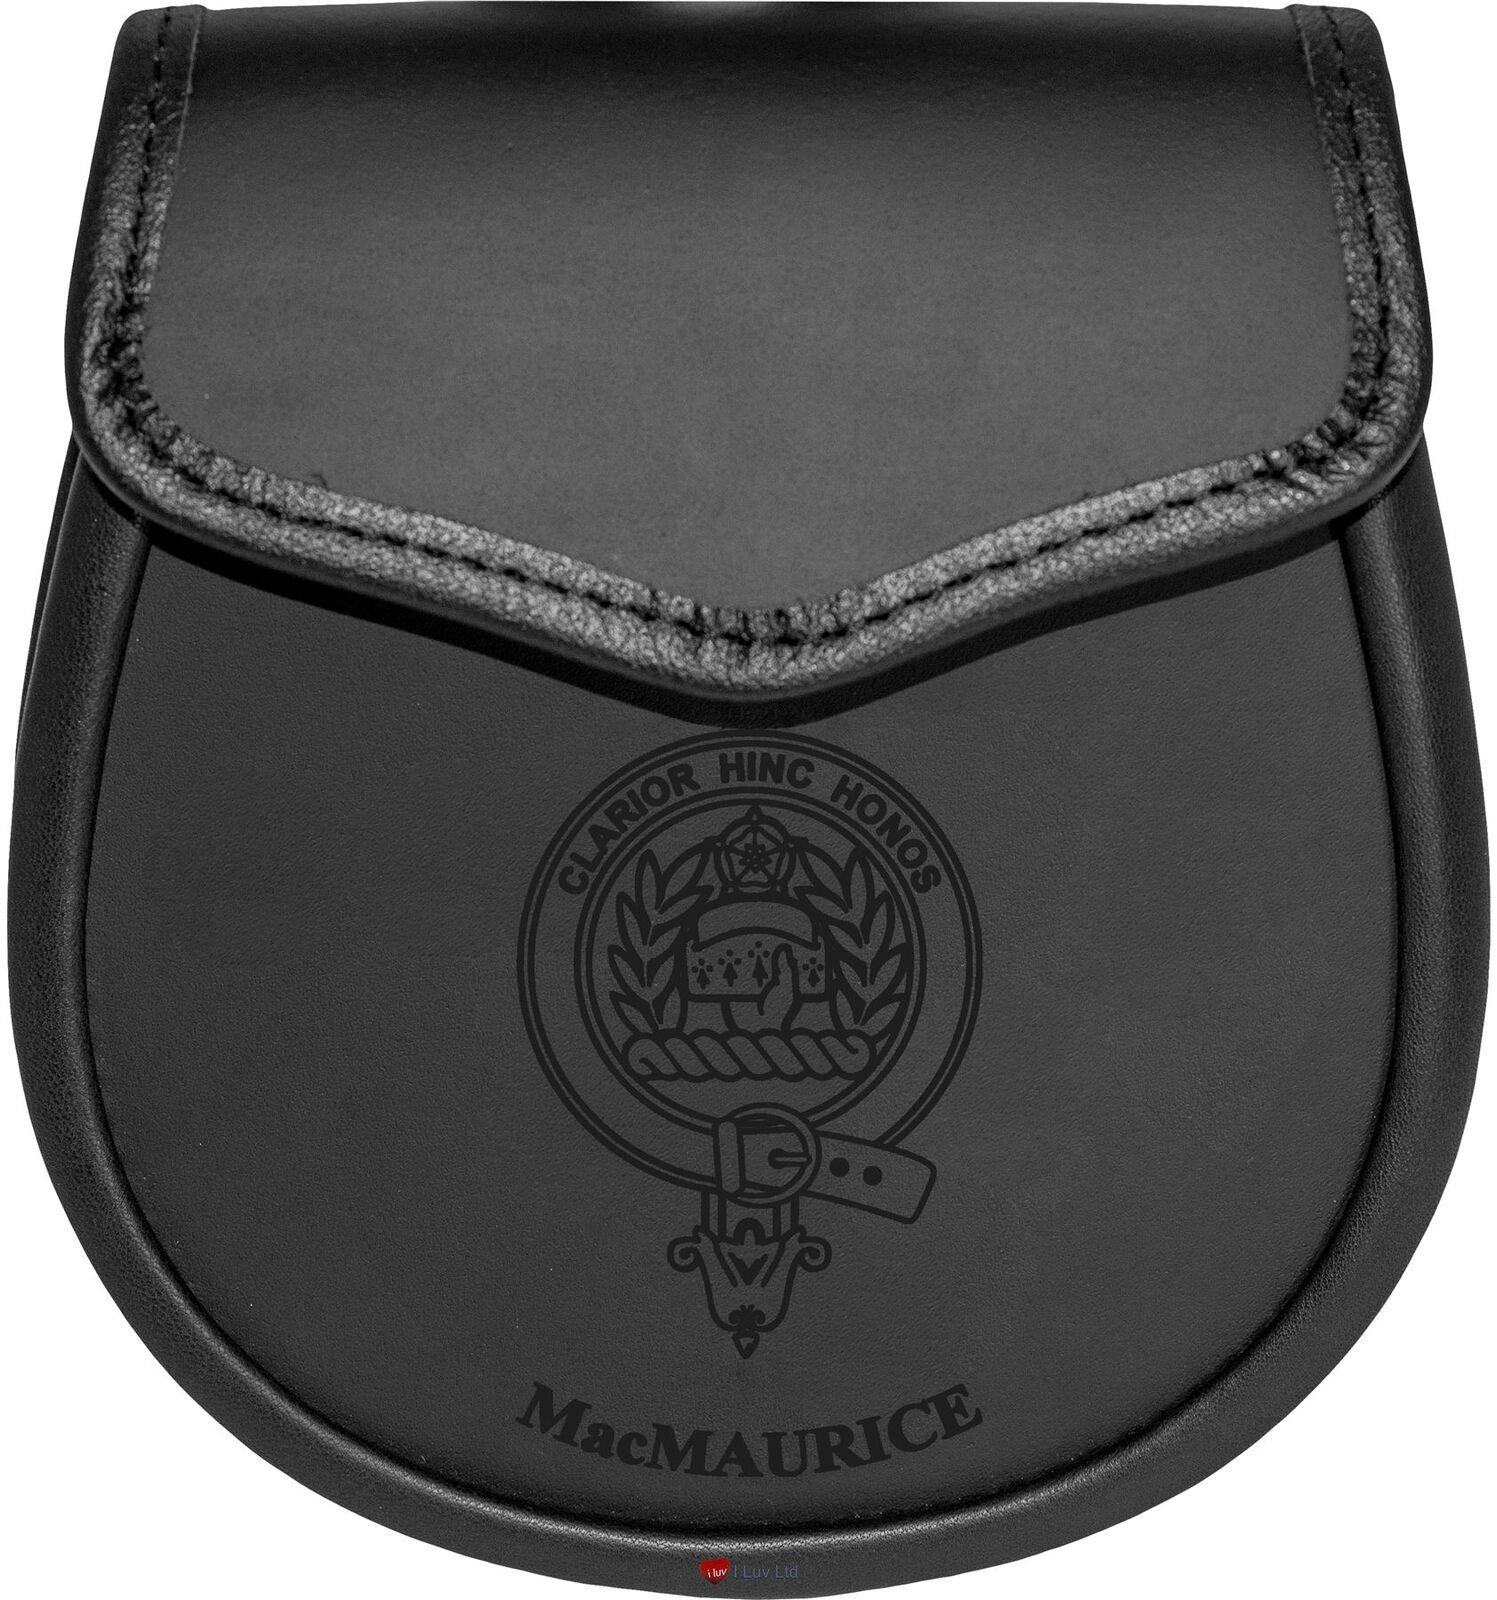 MacMaurice Leather Day Sporran Scottish Clan Crest